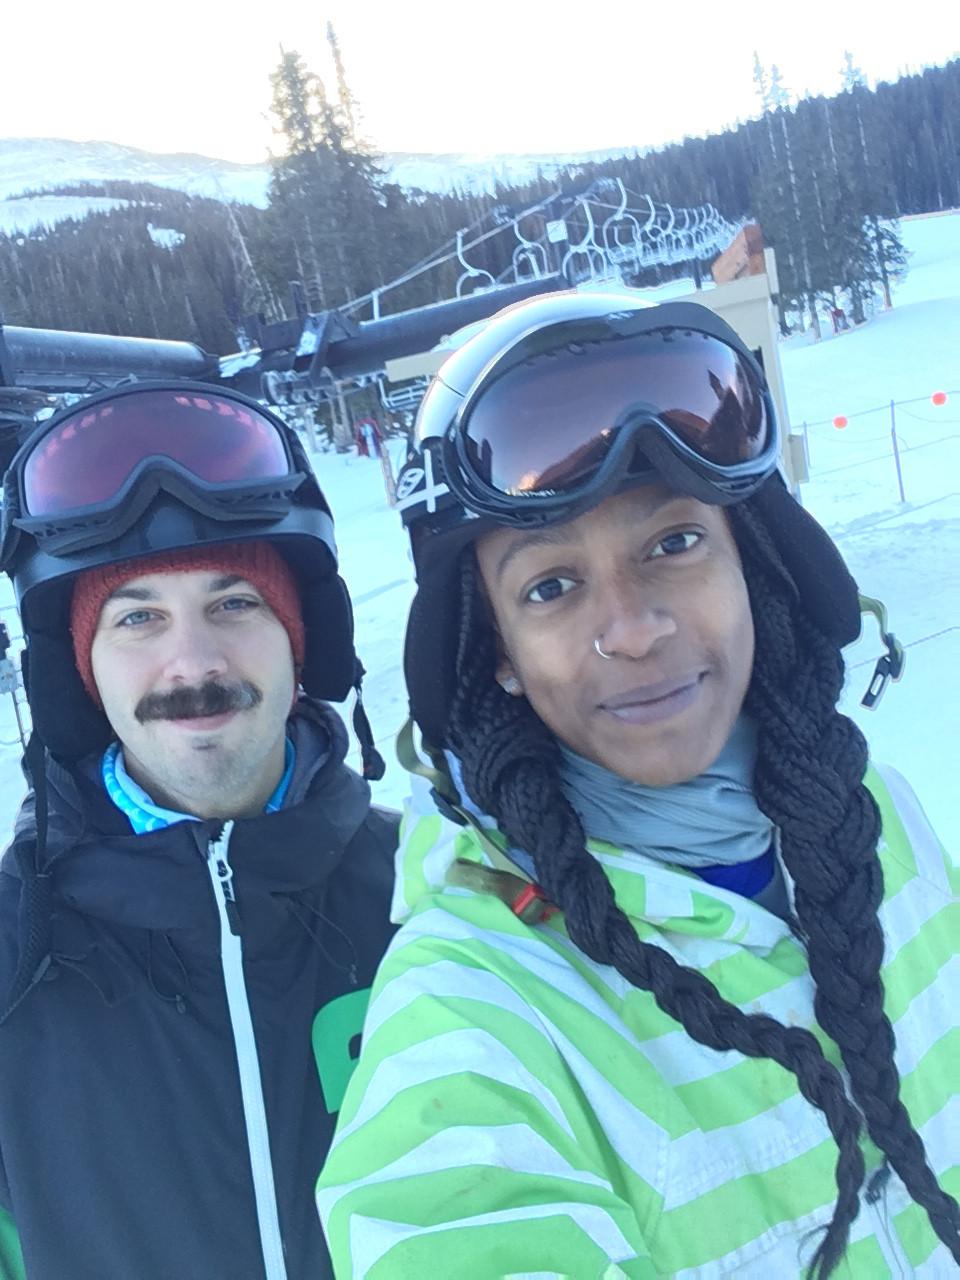 Snowboarding with my partner, J at Loveland!